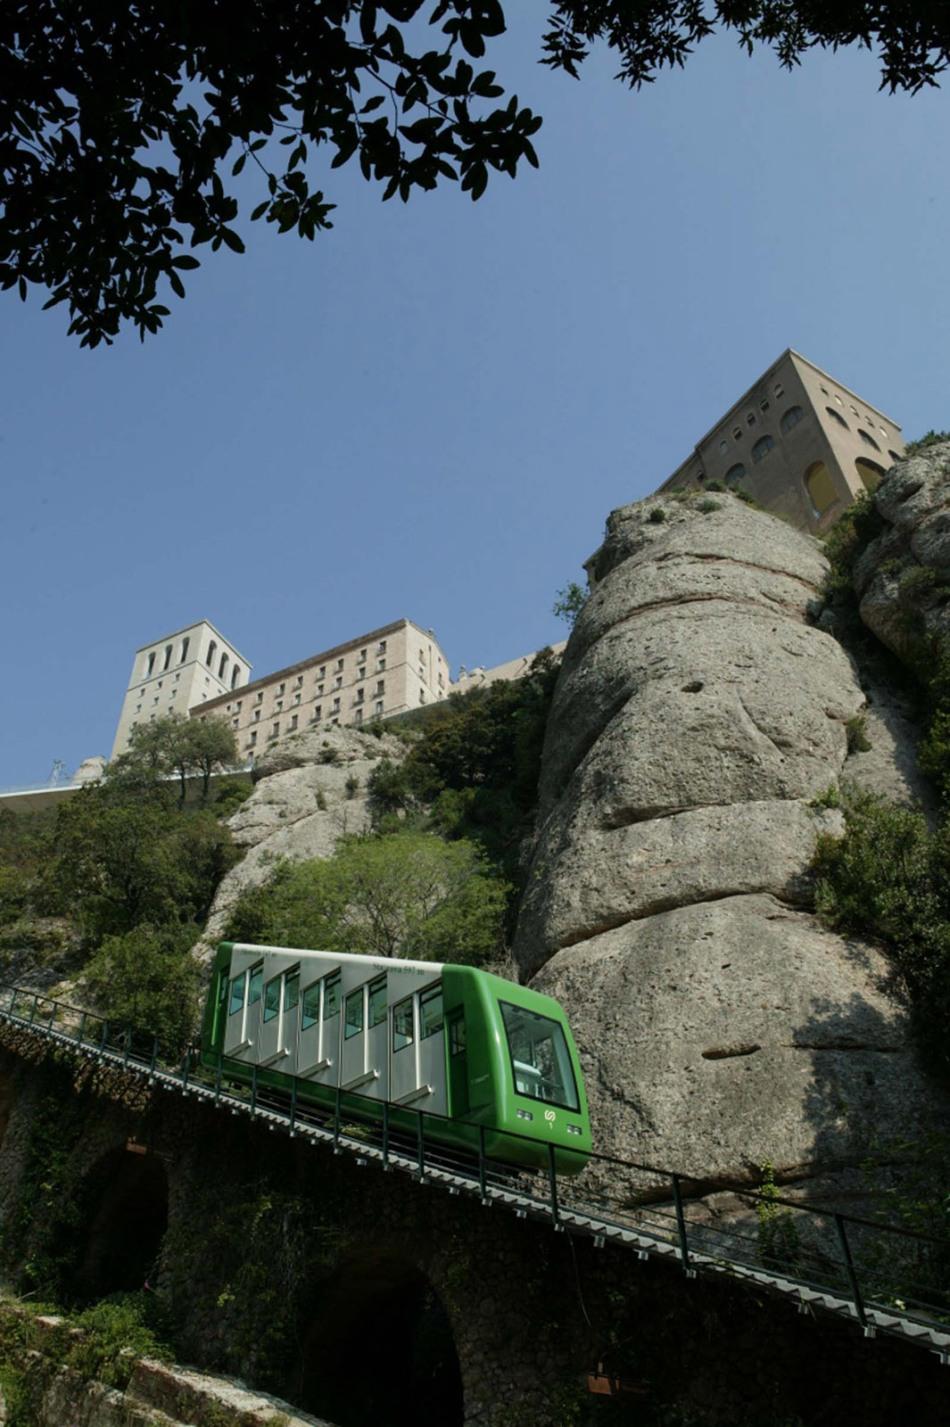 big-3-funiculars-montserrat-2-funicular-santa-cova-1-galeria-funicular-santa-cova-2-galeria-funicular-santa-cova.jpg